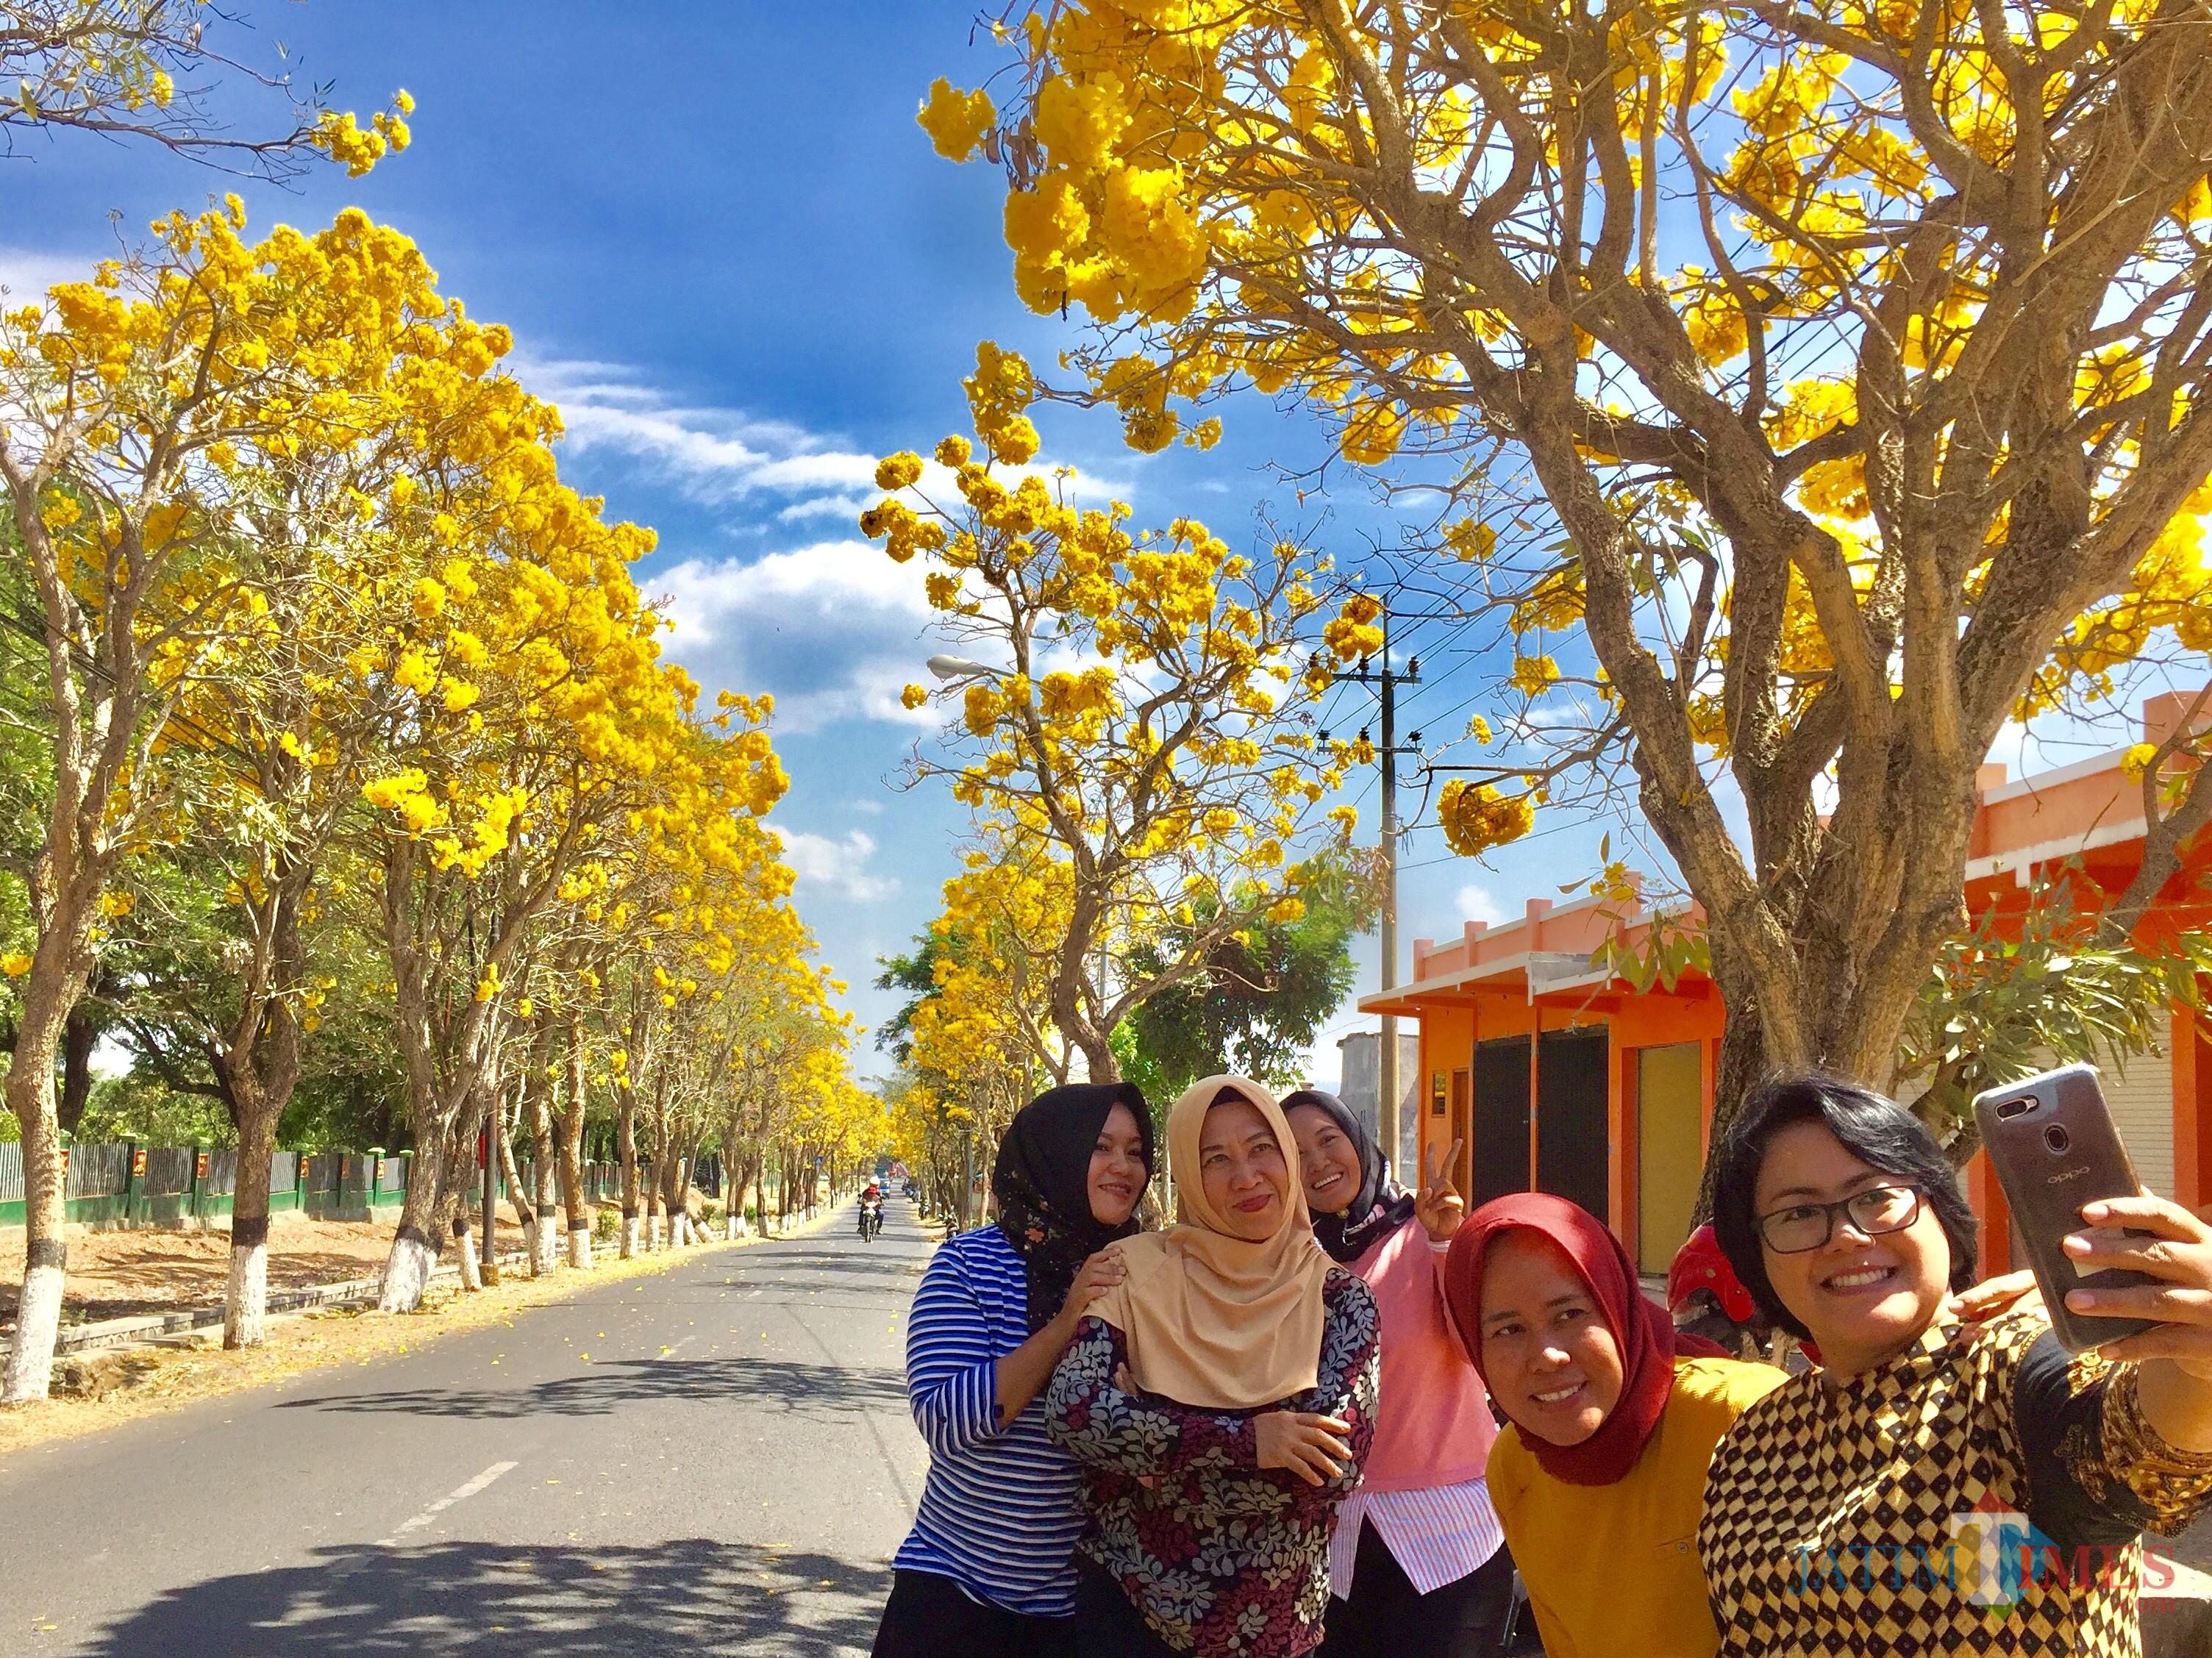 Masyarakat saat mengambil gambar latar belakang pohon tabebuya jalanKsatrian Arhanud, Desa Pendem Kecamatan Junrejo. (Foto: Irsya Richa/MalangTIMES)